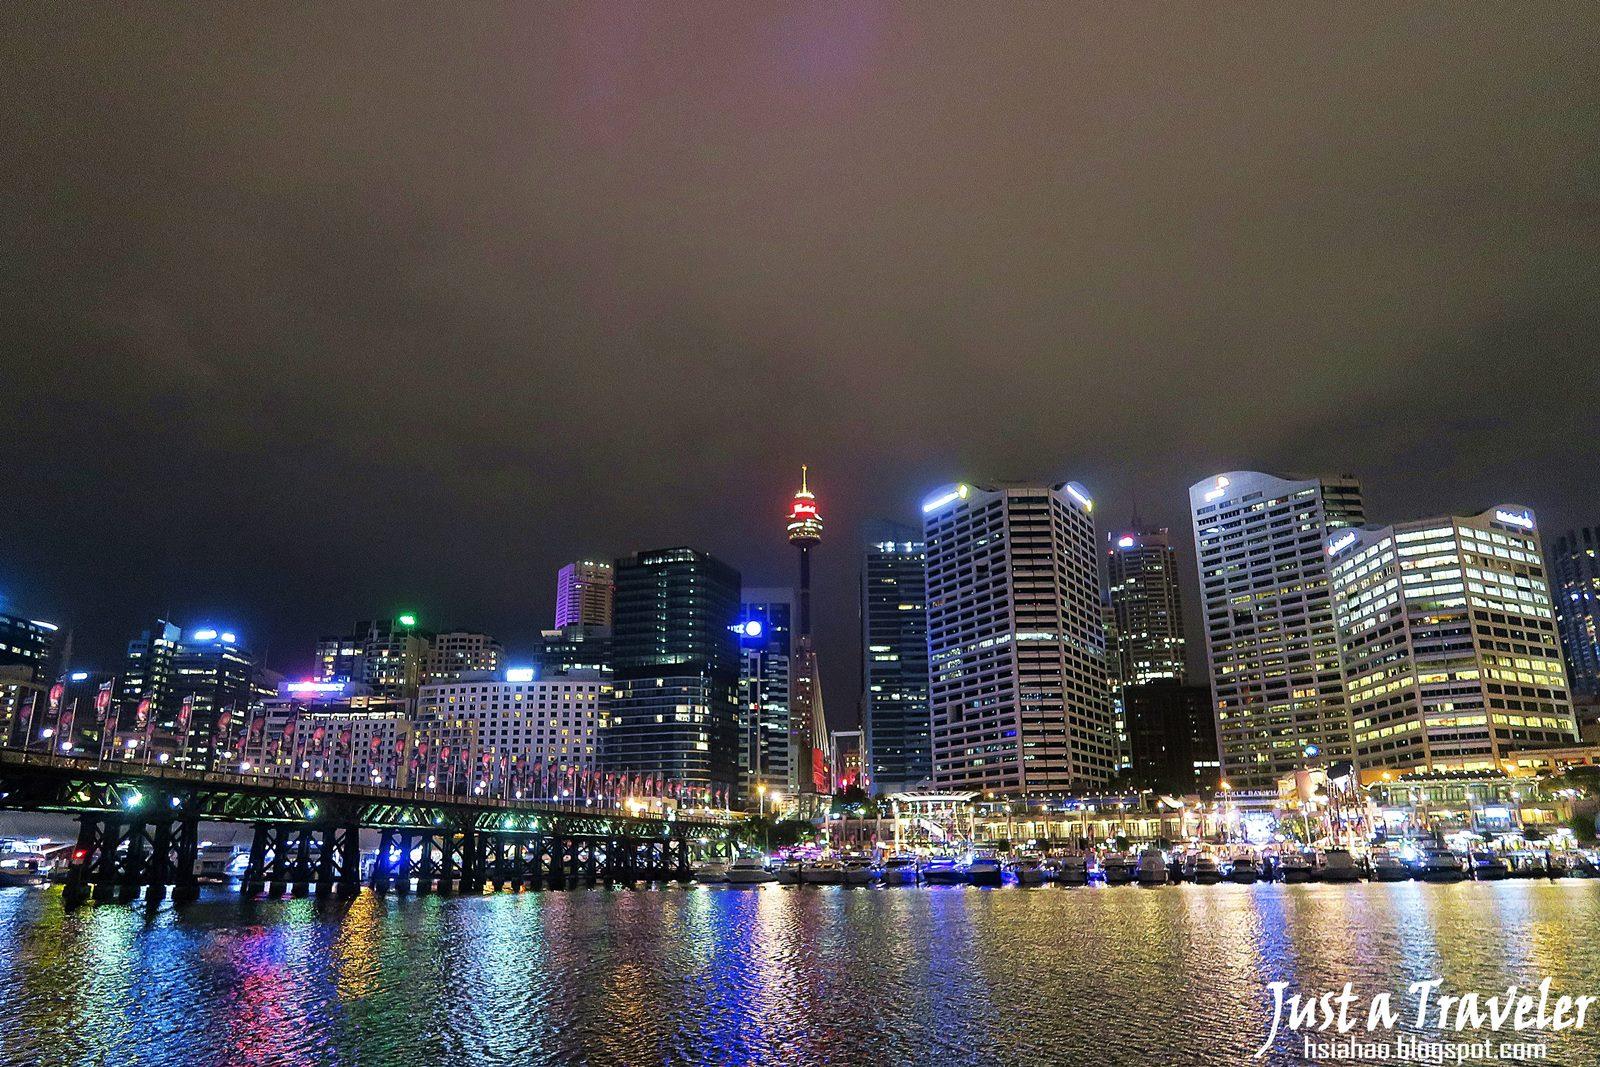 雪梨-景點-推薦-達令港-夜景-情人港-自由行-行程-旅遊-澳洲-Sydney-Darling-Harbour-Tourist-Attraction-Travel